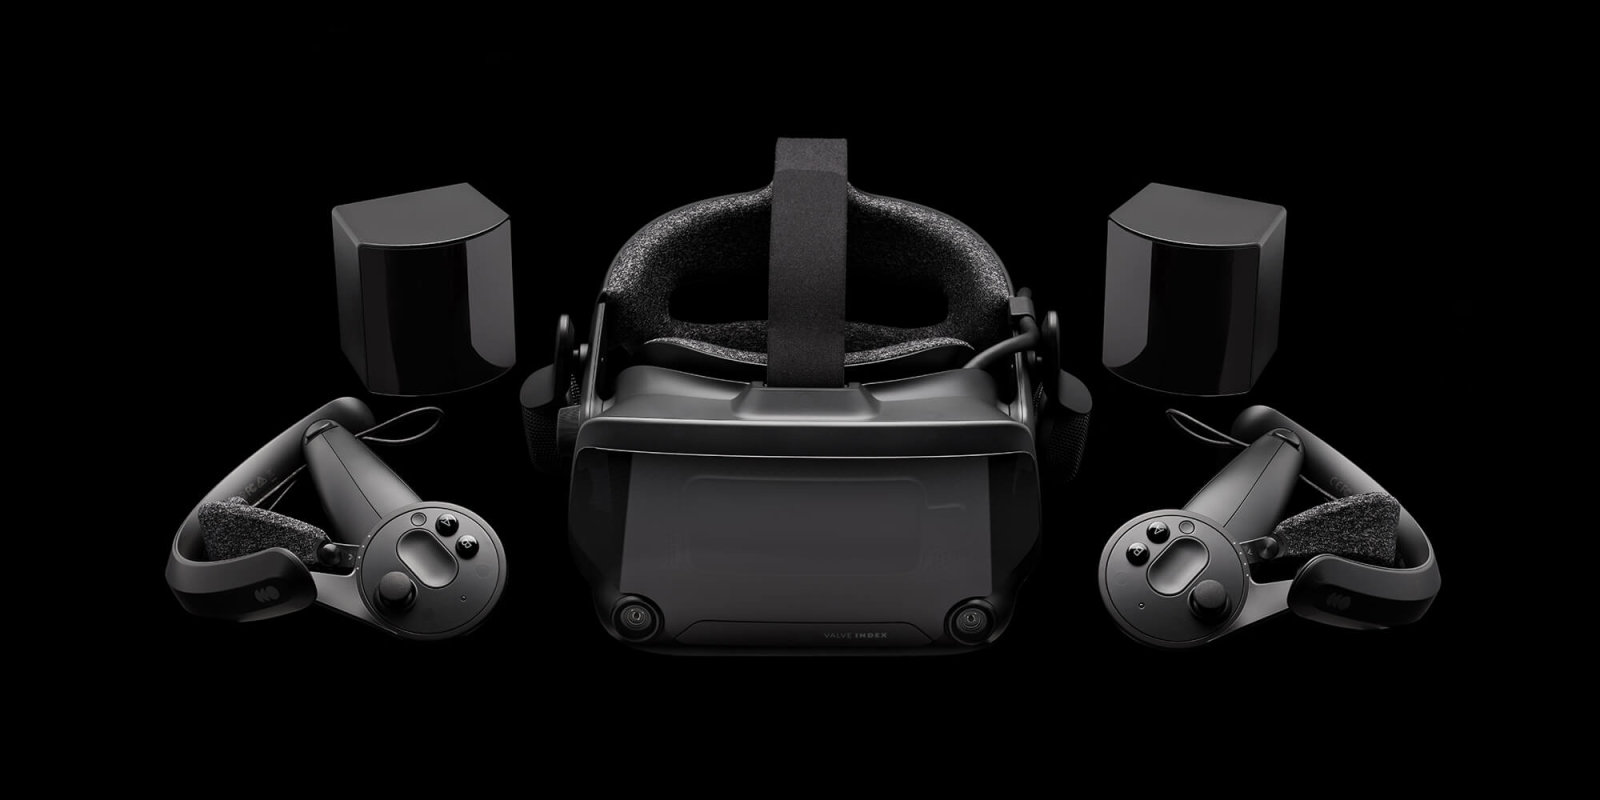 Valve-Index VR kit